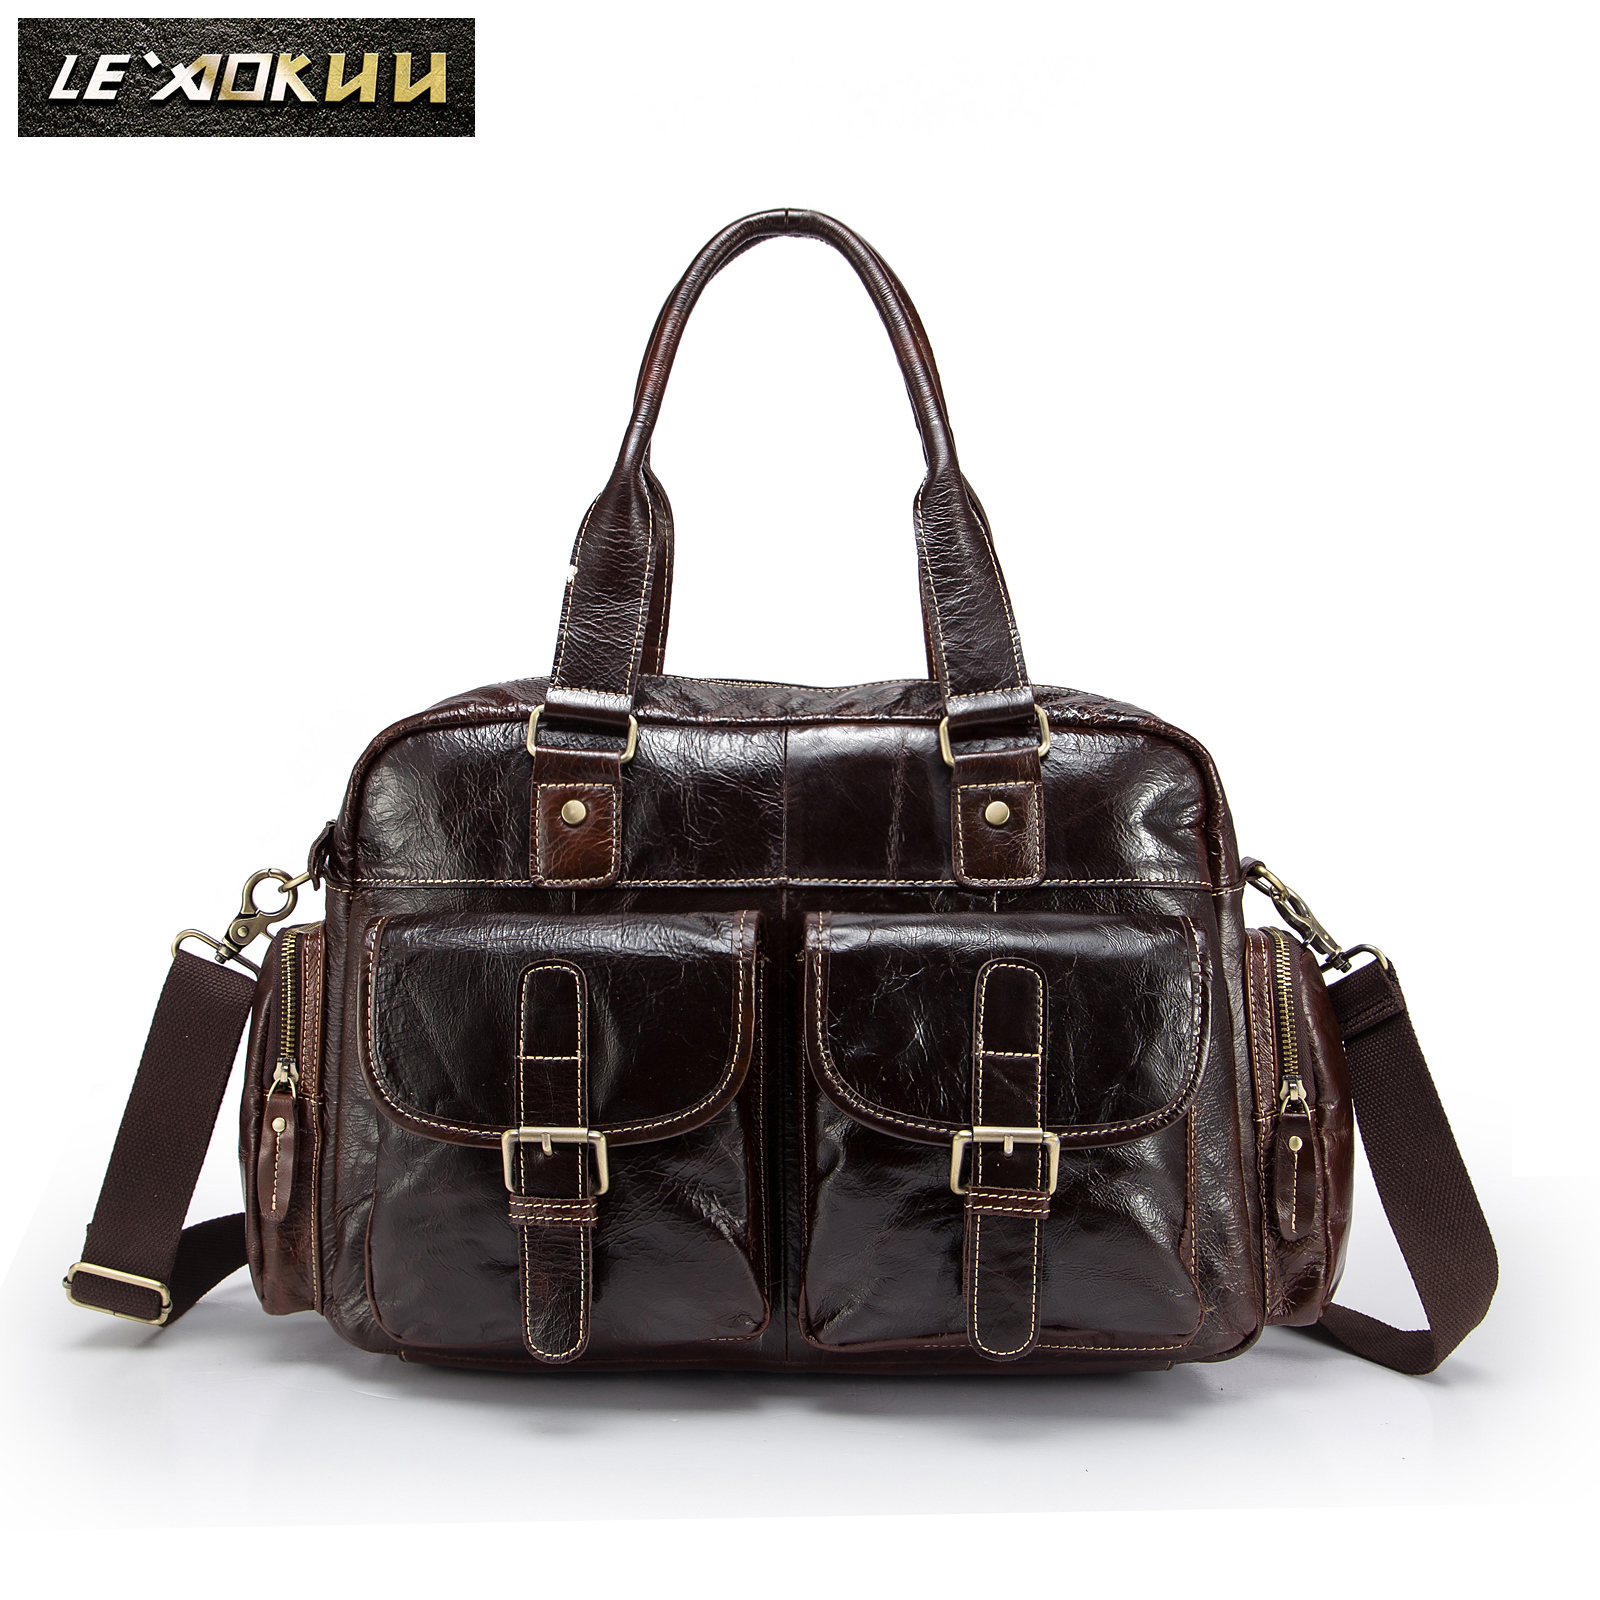 Hot Sale Design Leather Coffee Casual Fashion Men Briefcase Business Laptop Case Attache Messenger Bag Tote Bag For Men 061c